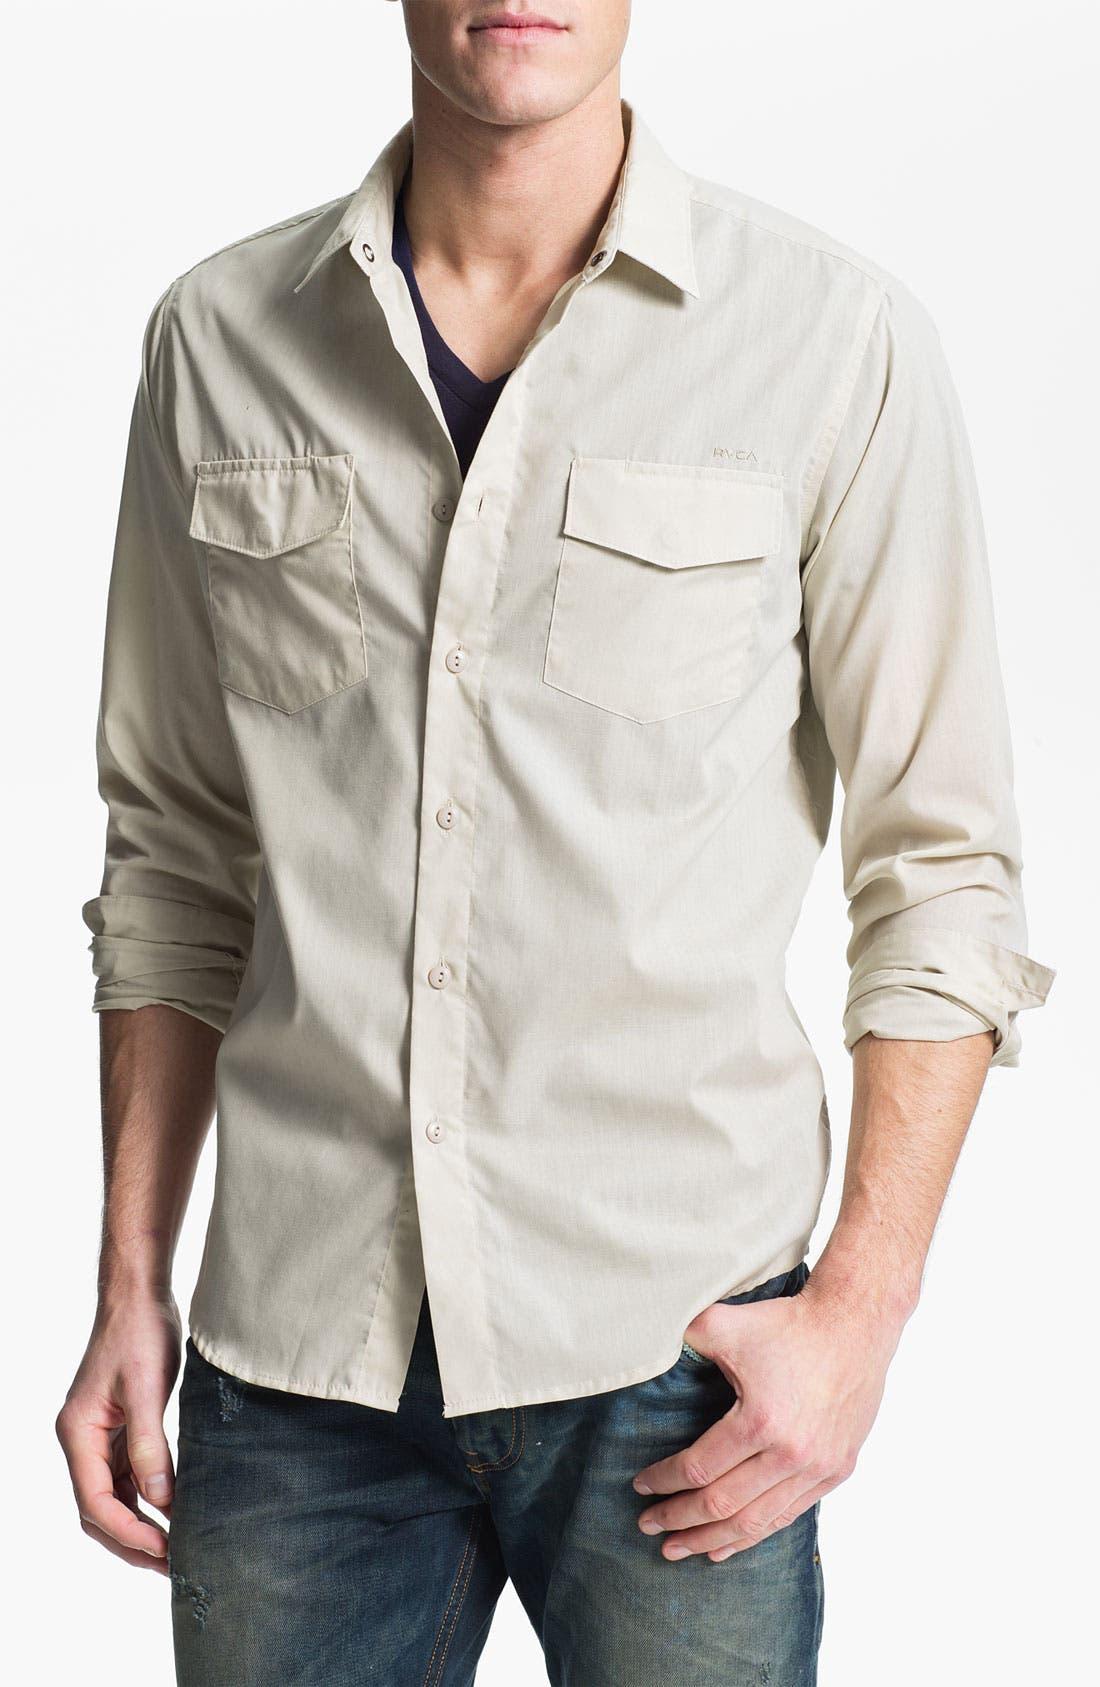 Alternate Image 1 Selected - RVCA 'Republic' Woven Shirt